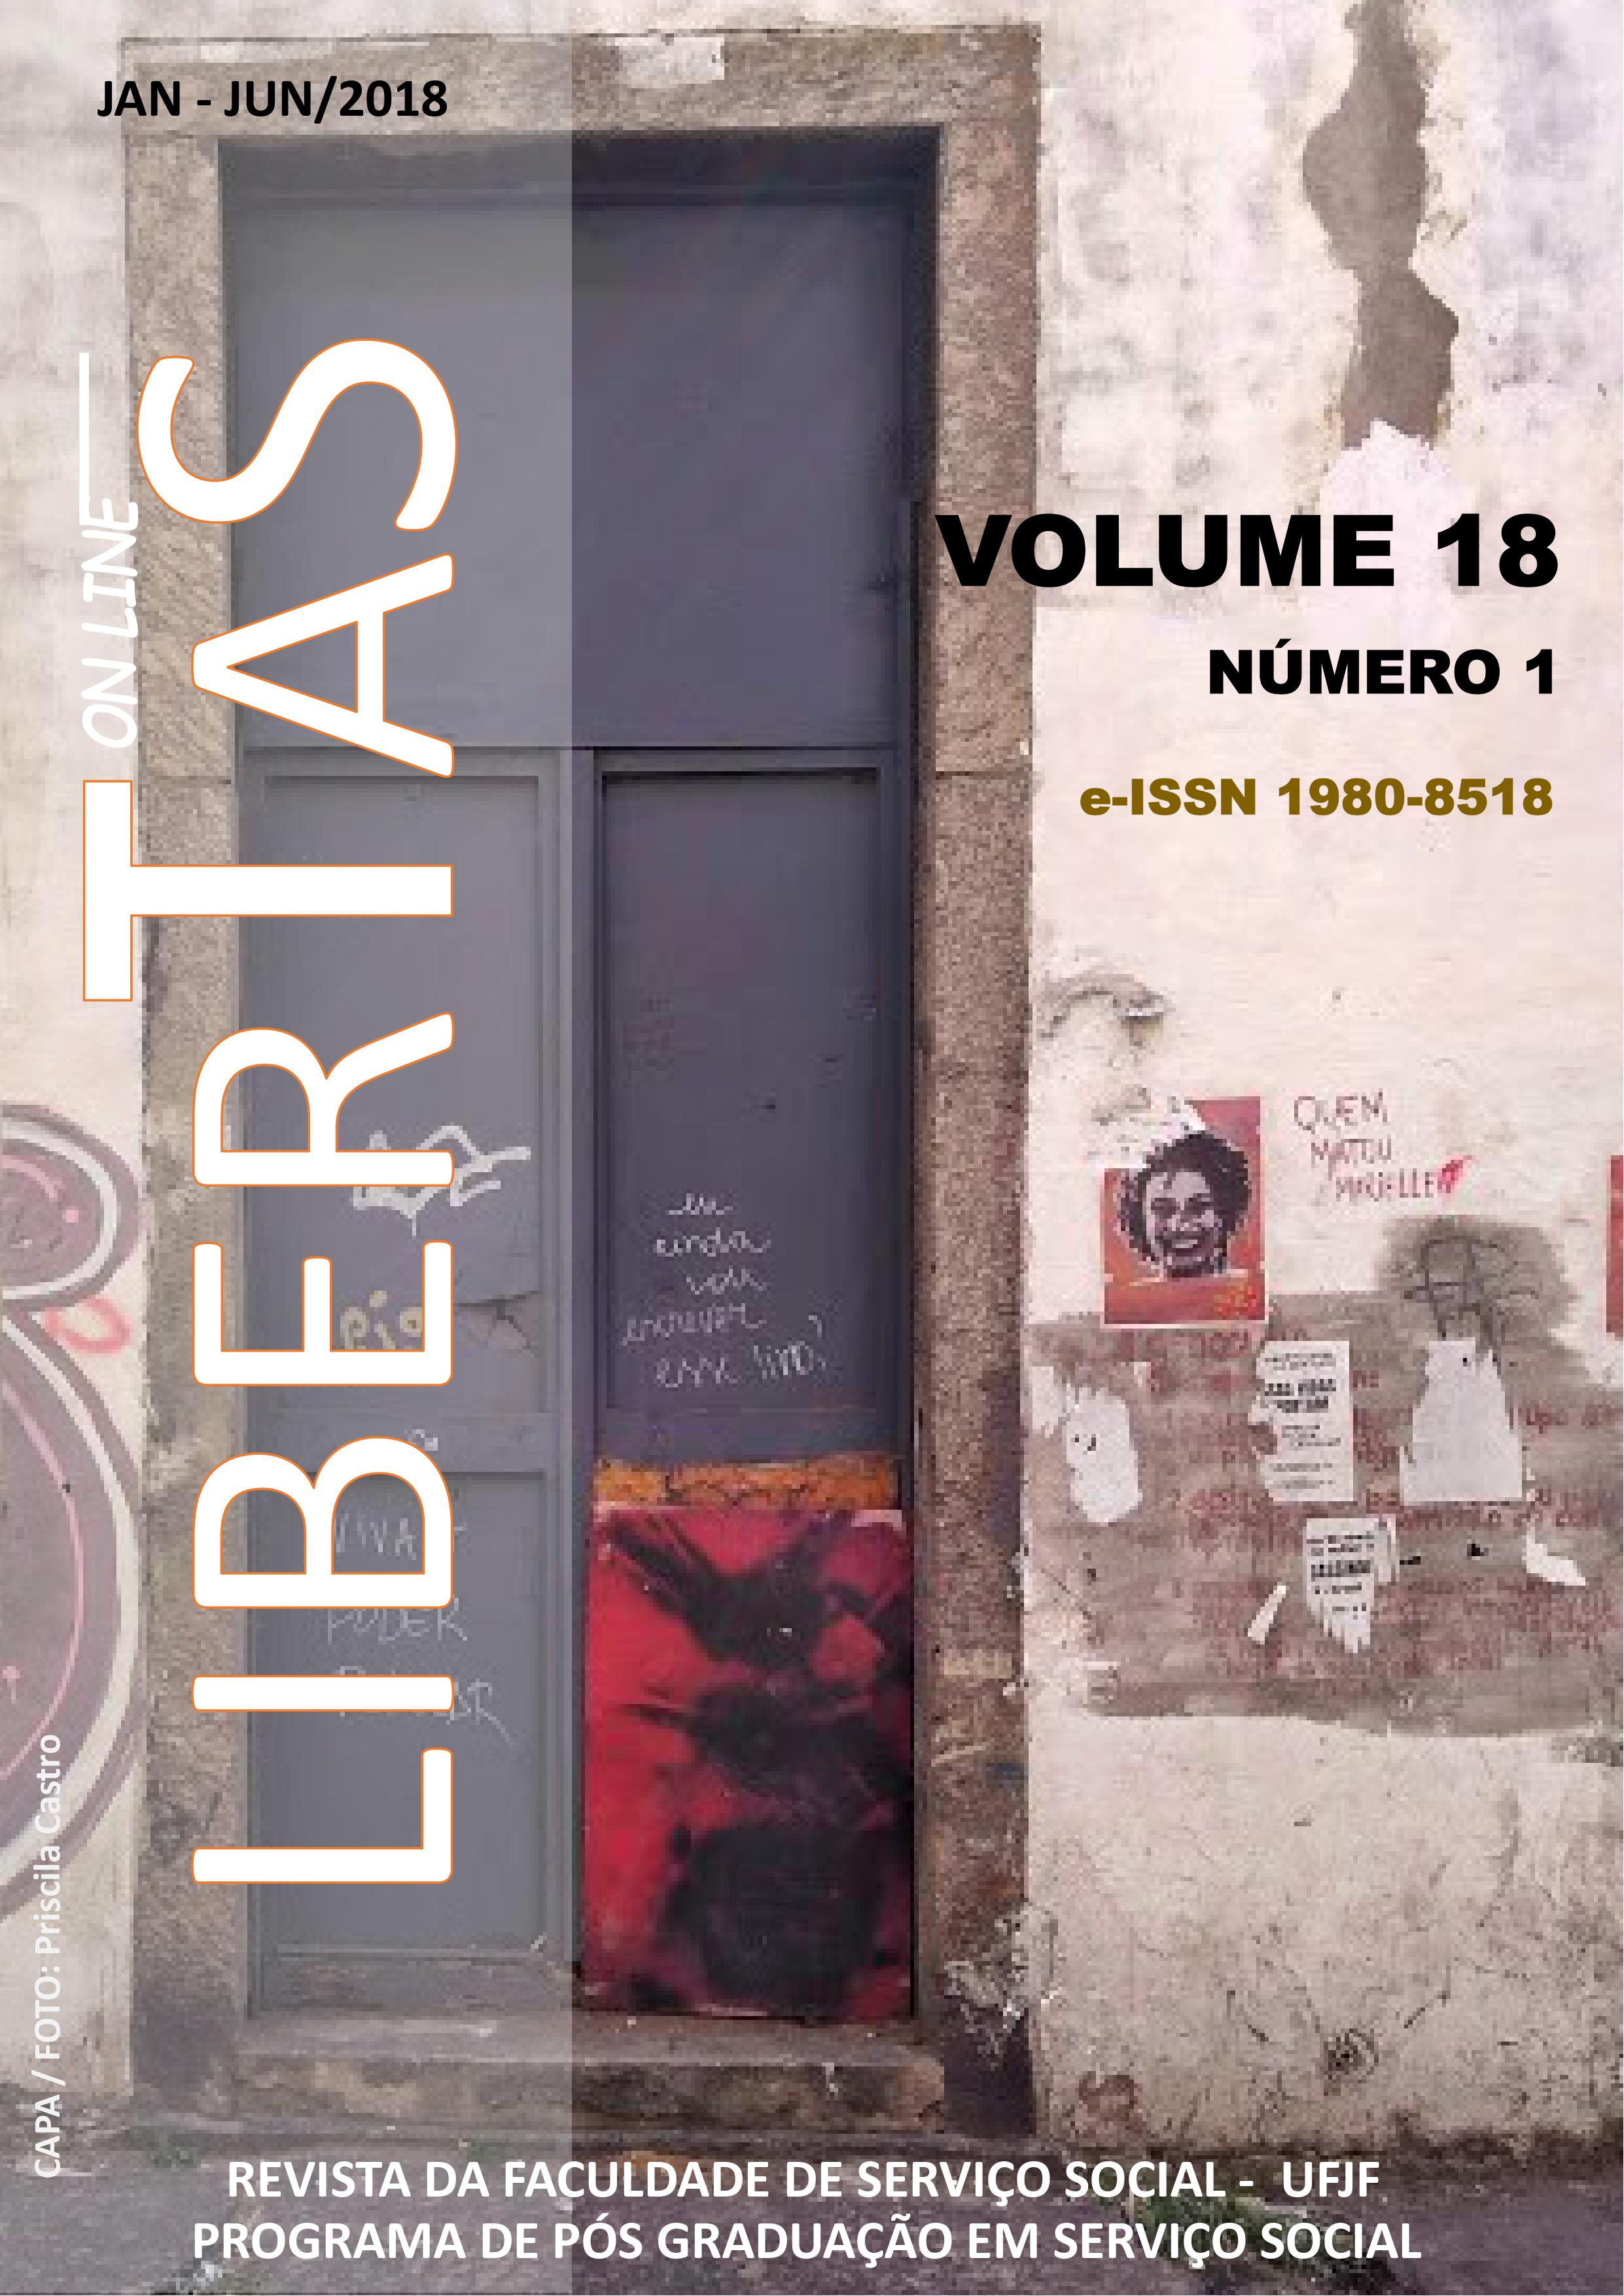 Visualizar v. 18 n. 1 (2018): Revista Libertas - ISSN: 1980-8518 (jan. jun. 2018)